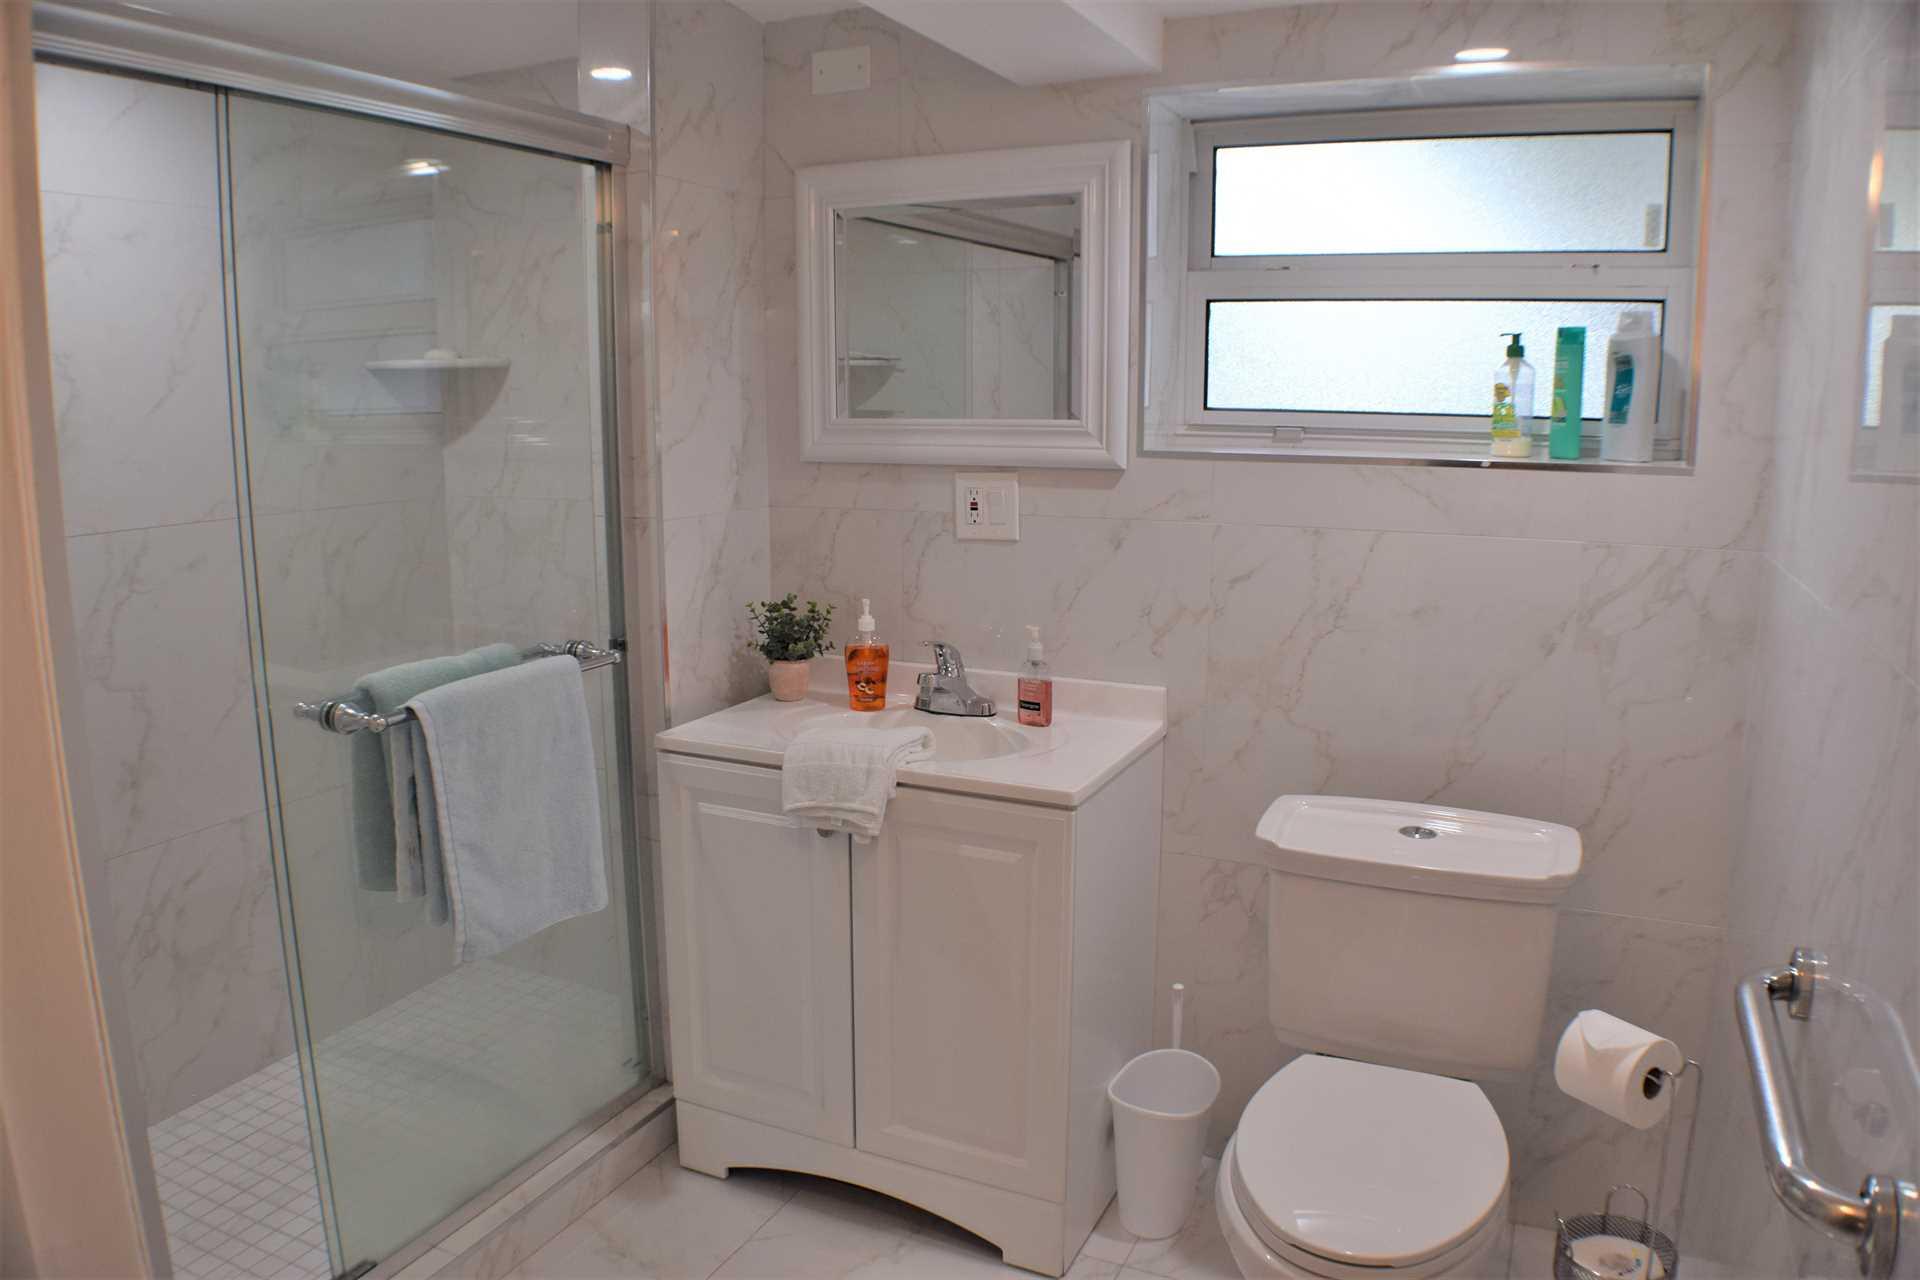 Ensuite bathroom has a walk in shower.